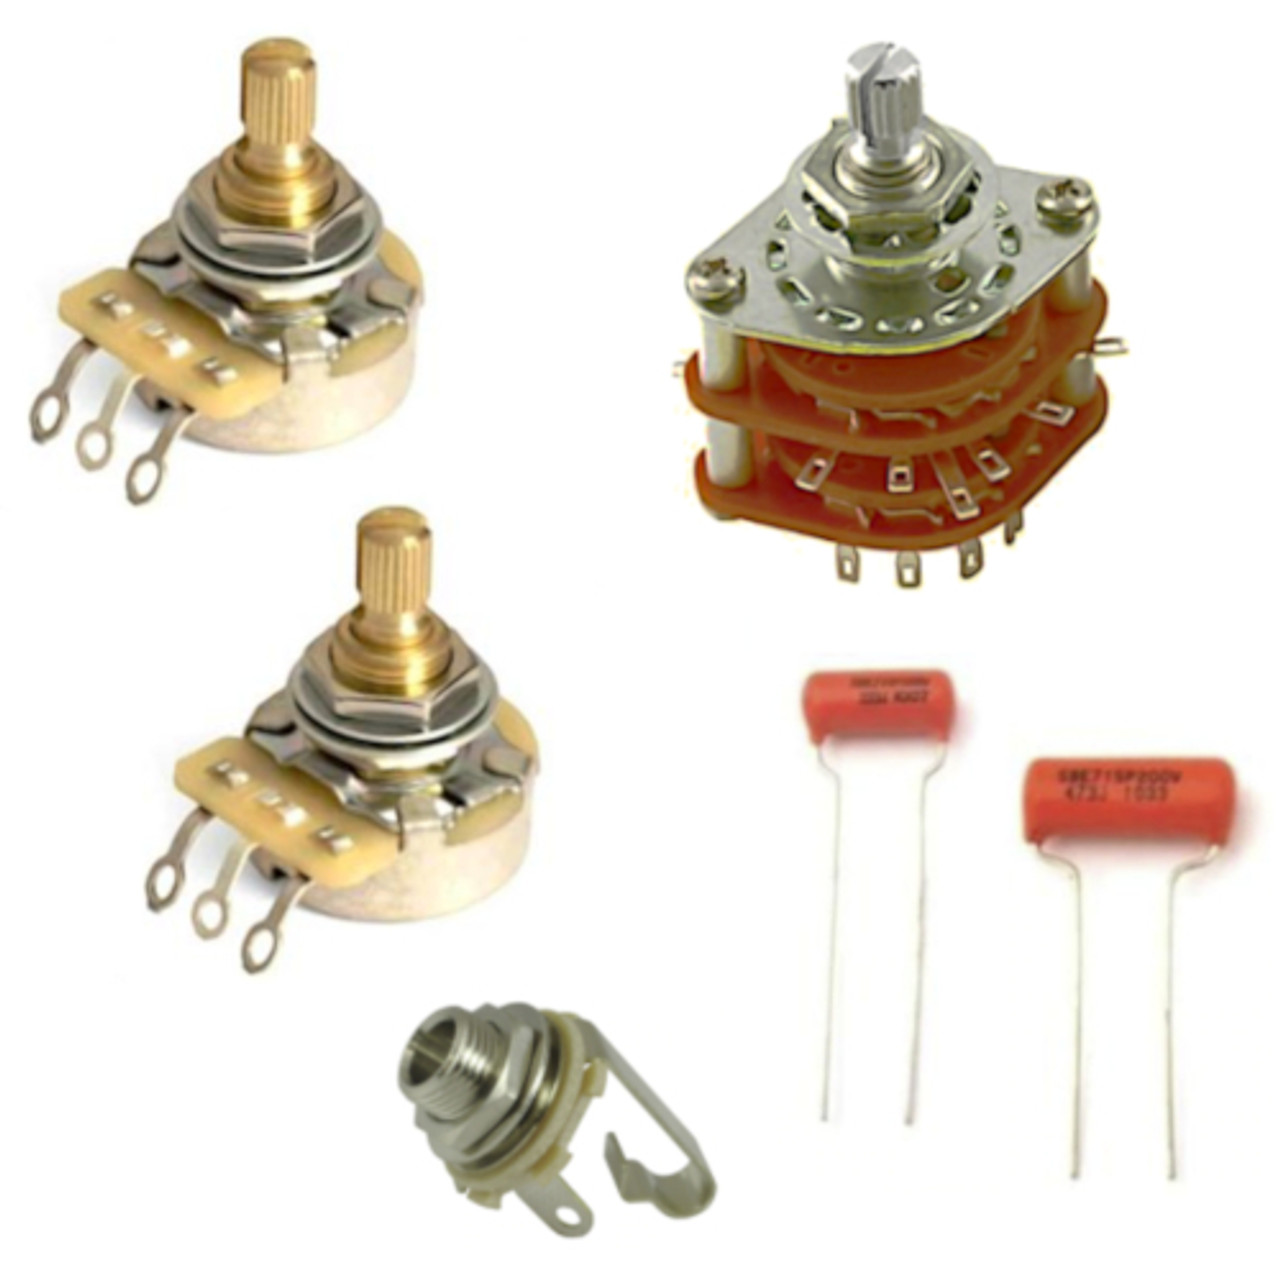 5-Way Rotary Switch Guitar Electronics Kit w/ CTS Pro Pots-500K